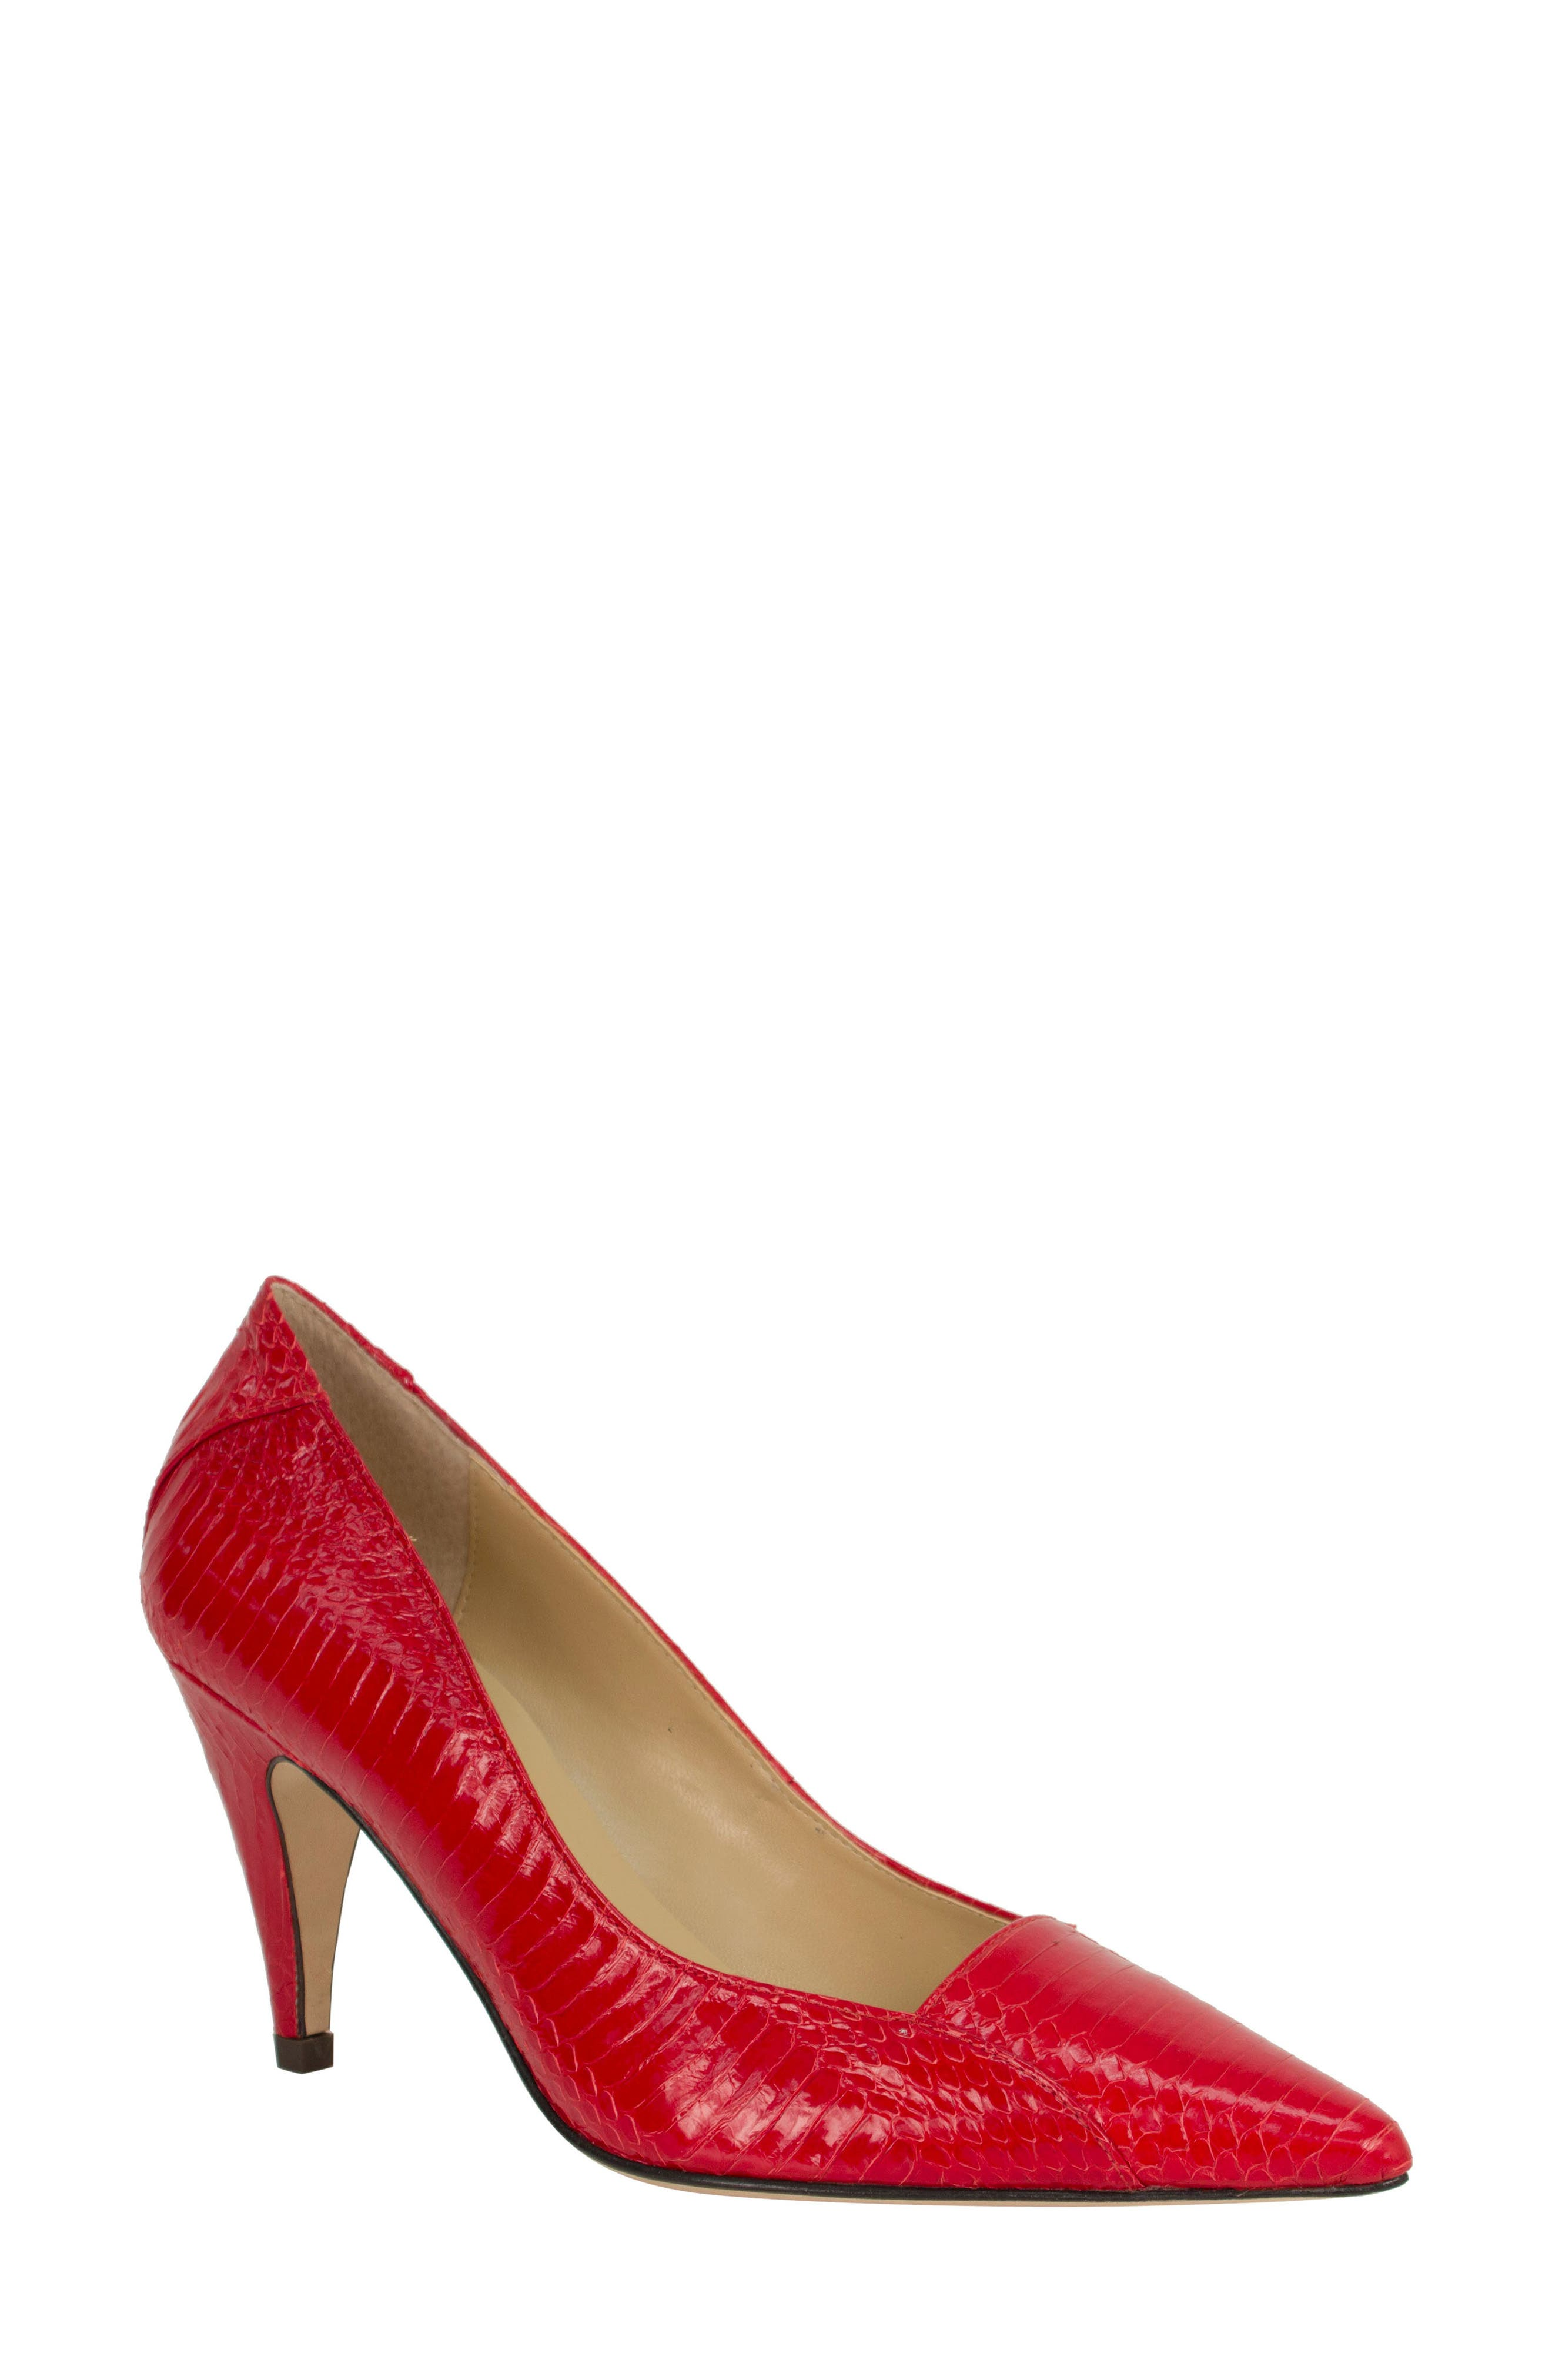 J. Renee Cobra Pointy Toe Pump B - Red